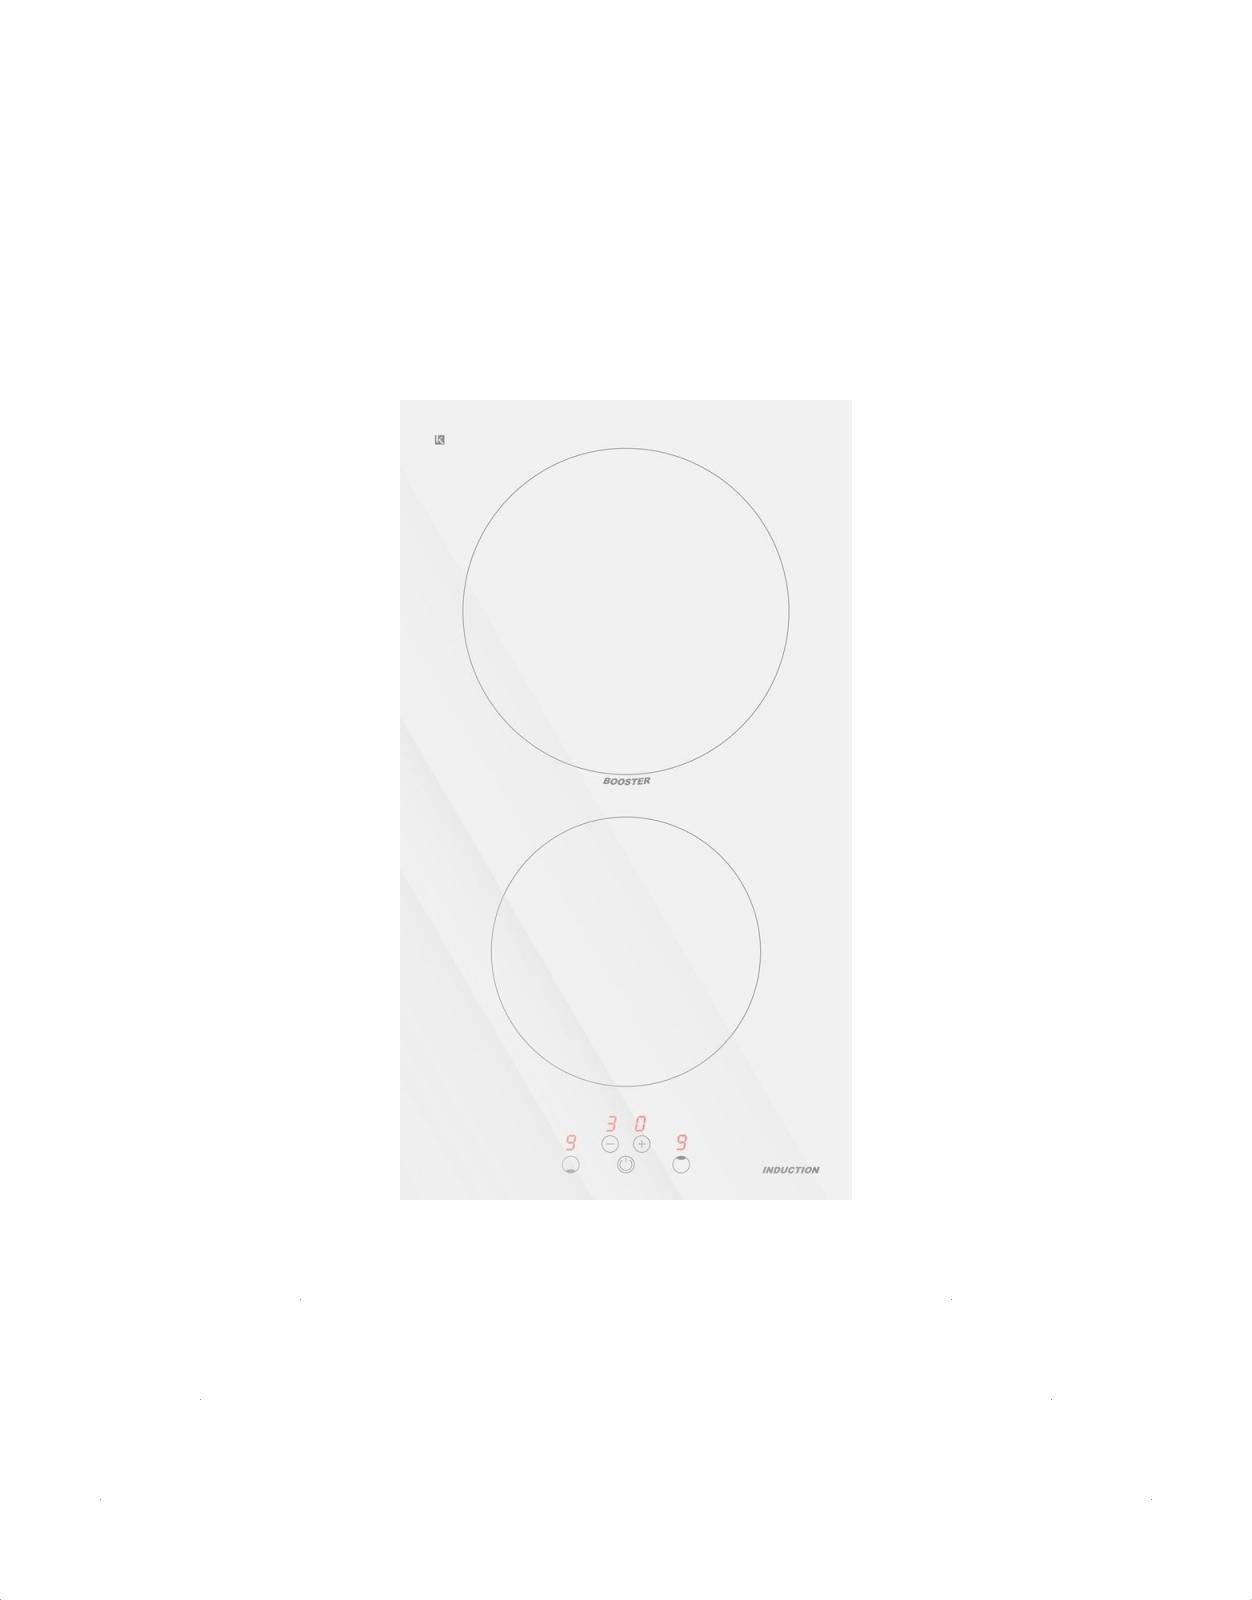 Decoland valge Domino 30 cm induktsioonplaat IN30W